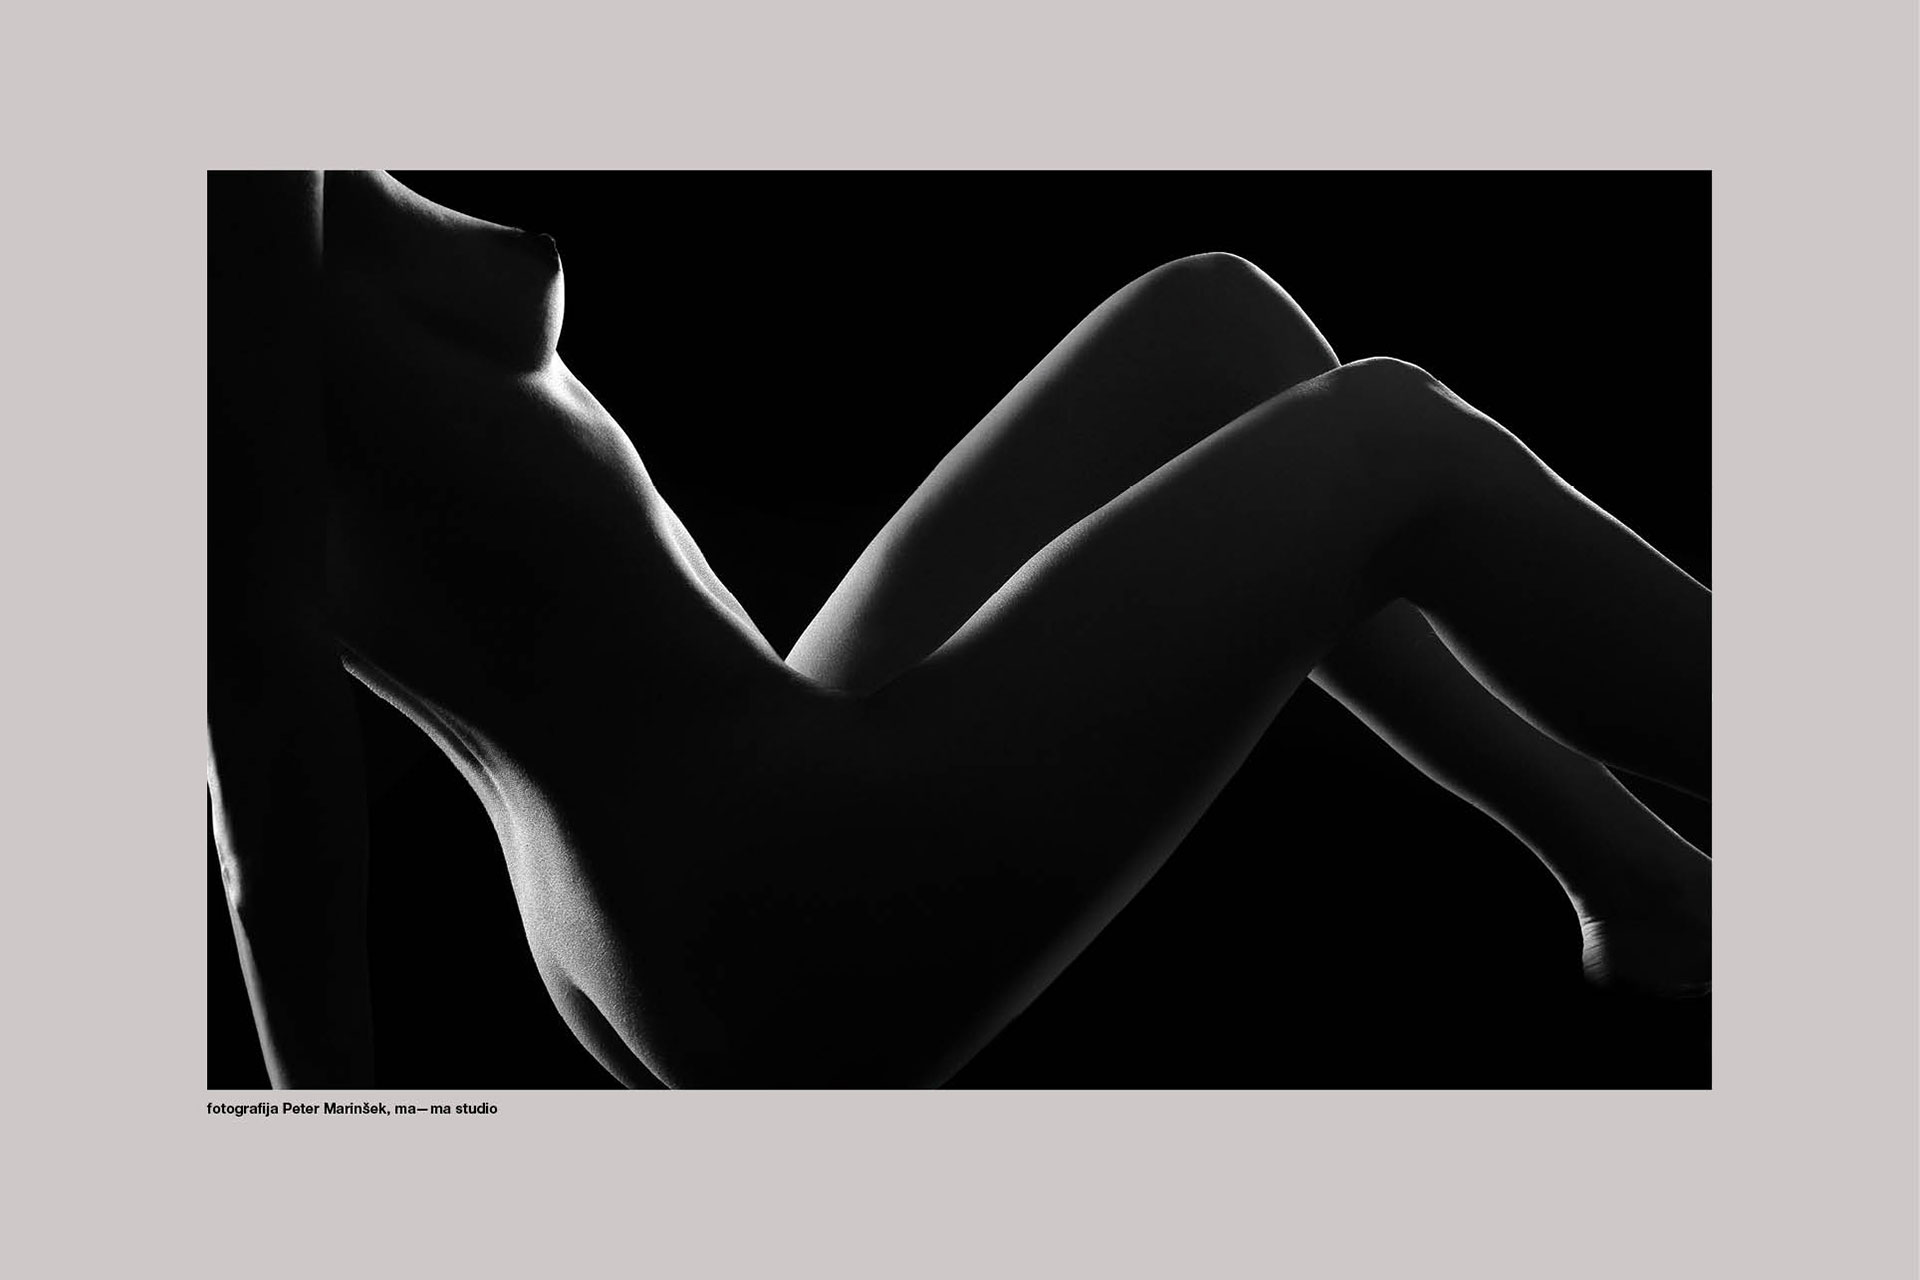 elastomeri_peter_marinsek_fotografija_studio_ma-ma10